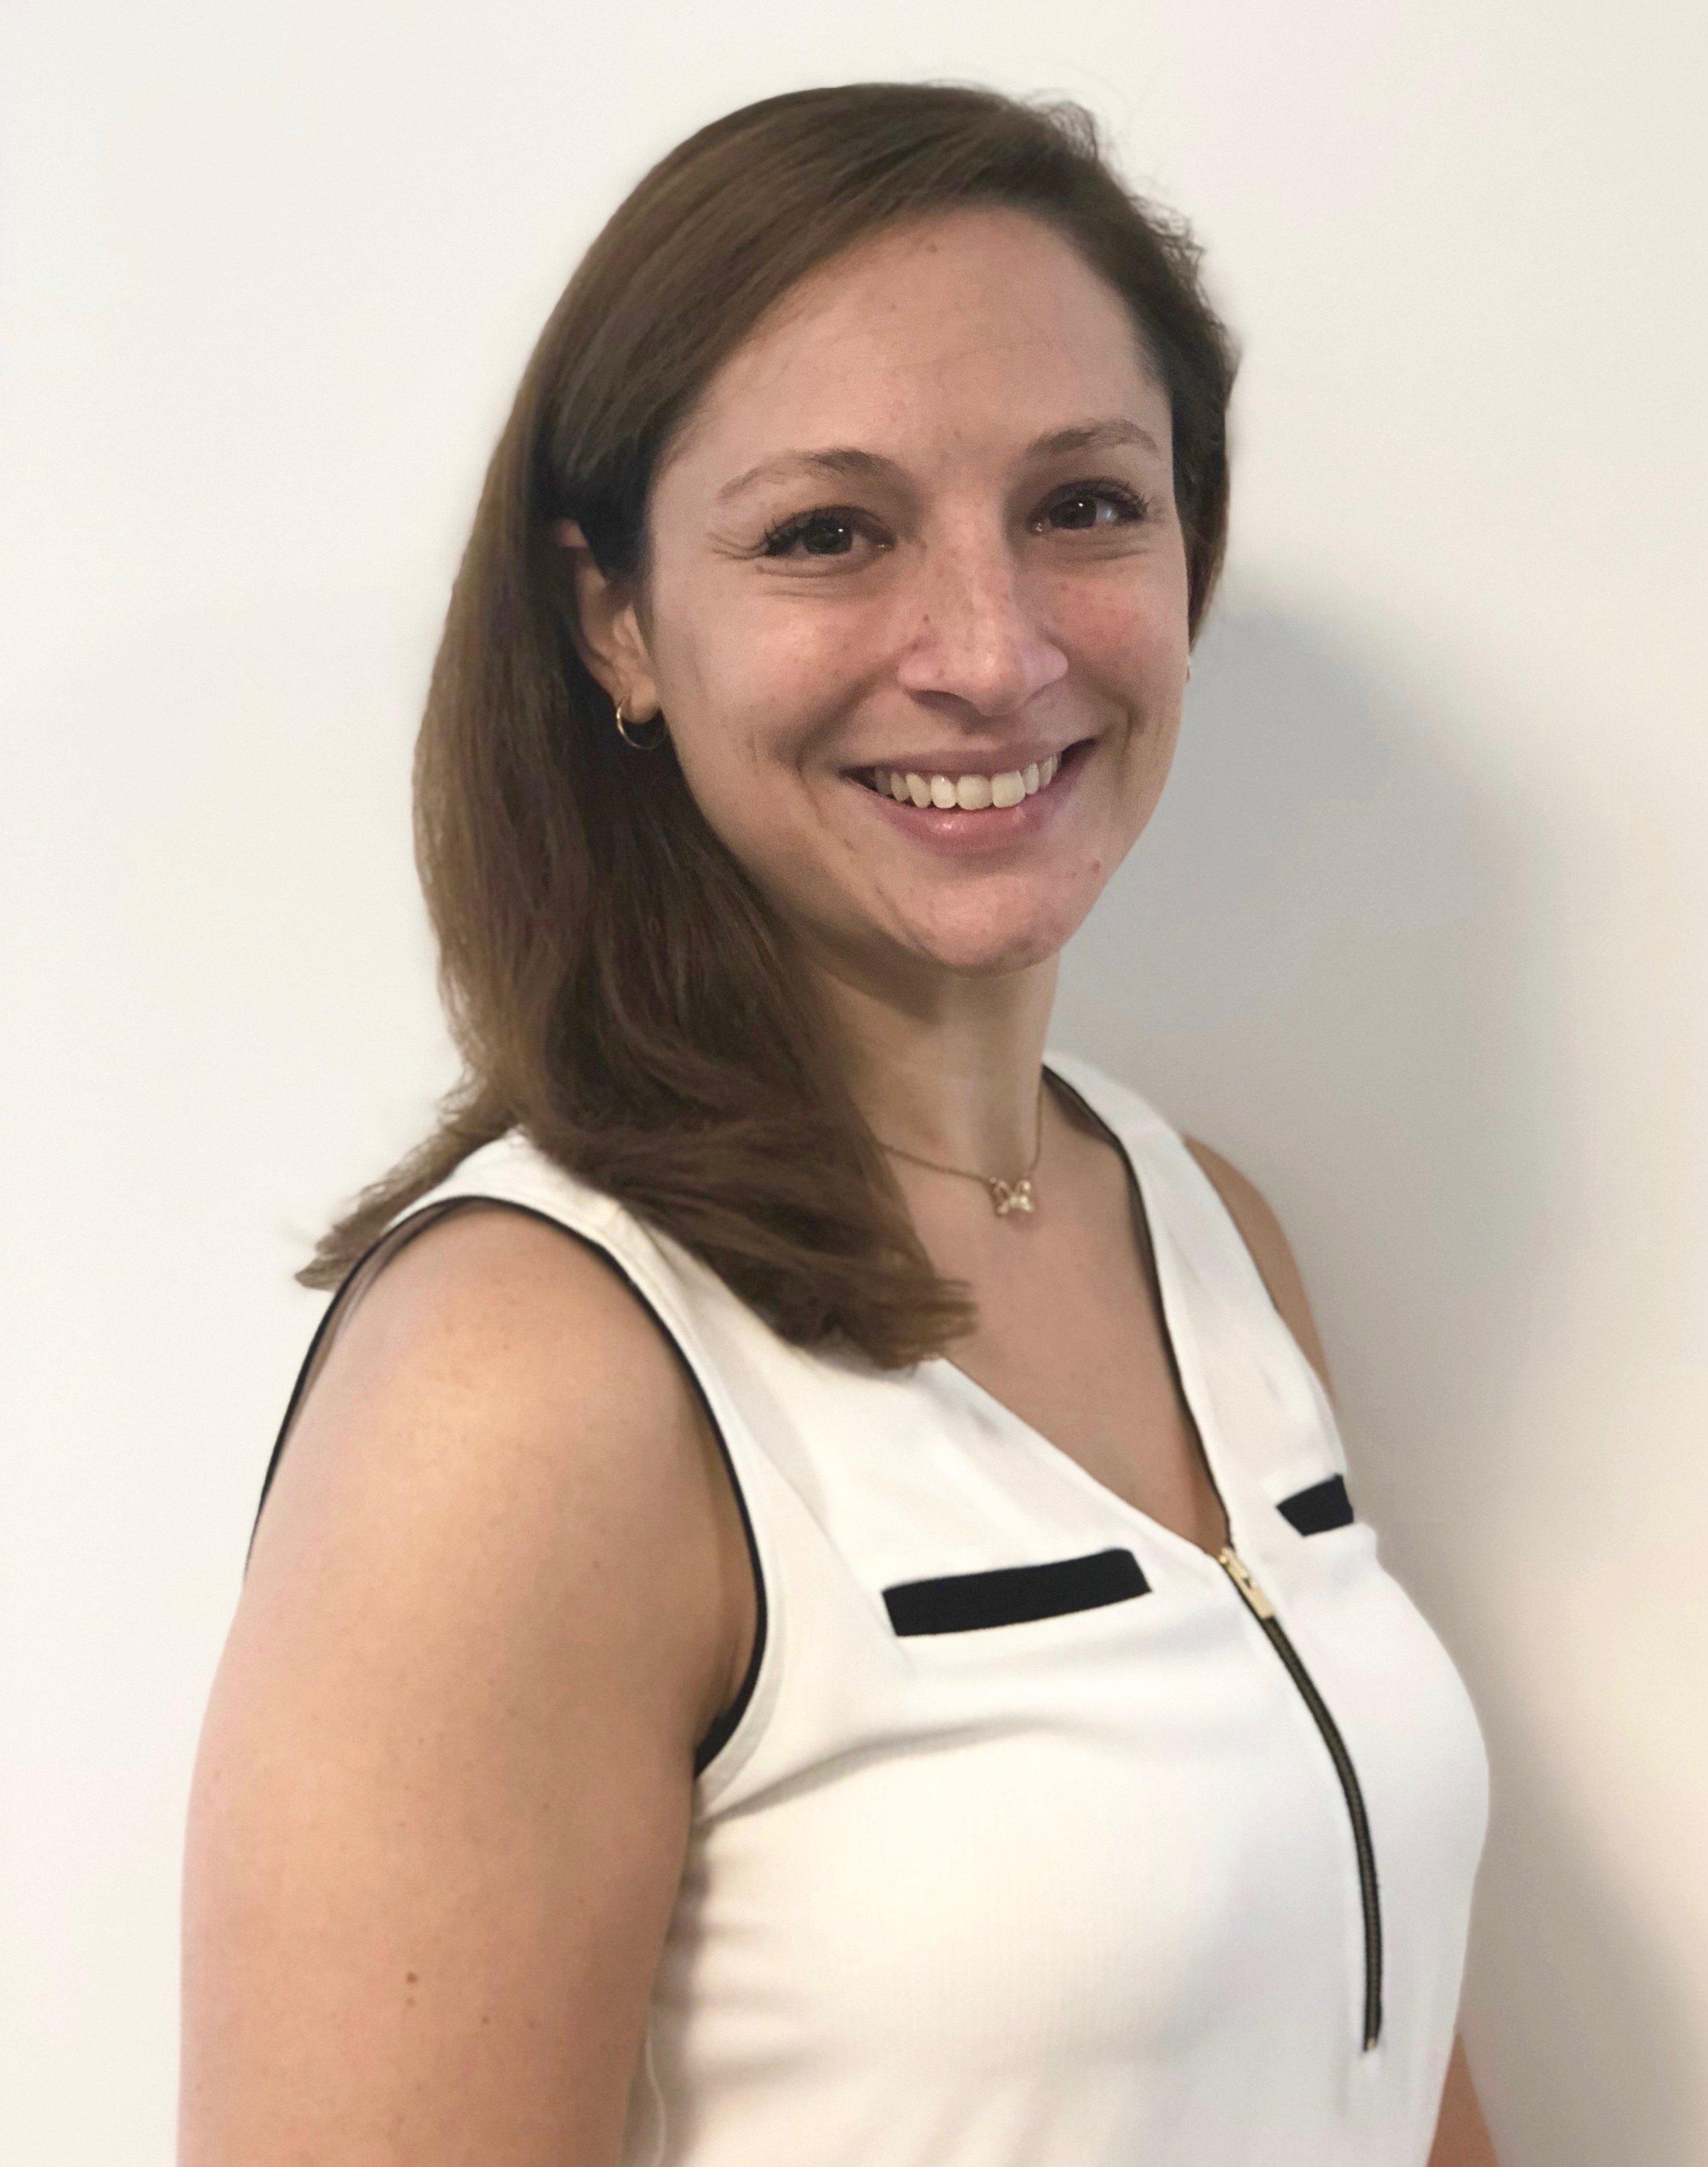 PatientPing Employee Spotlight: Sarah Wigman, Northeast Market Operations Lead